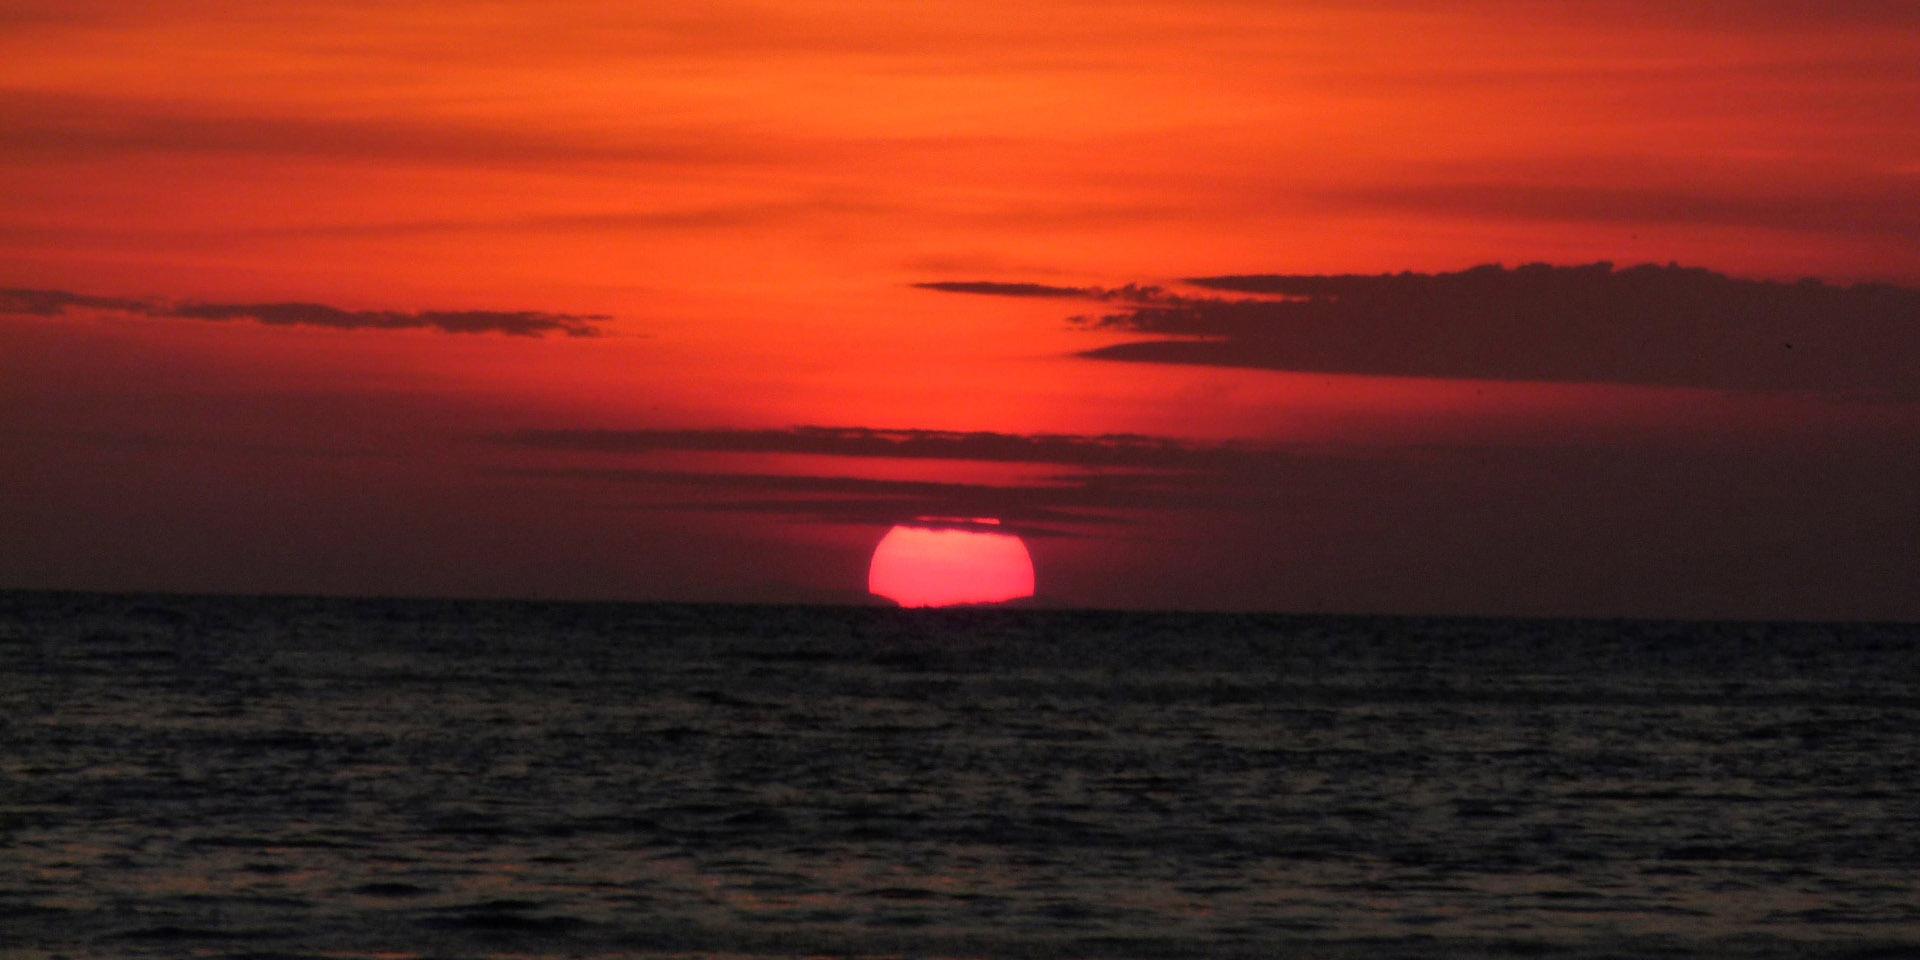 tours-malawian-style-malawi-adventures-experiences-holidays-specialist-tour-operator-malawi-sunrise